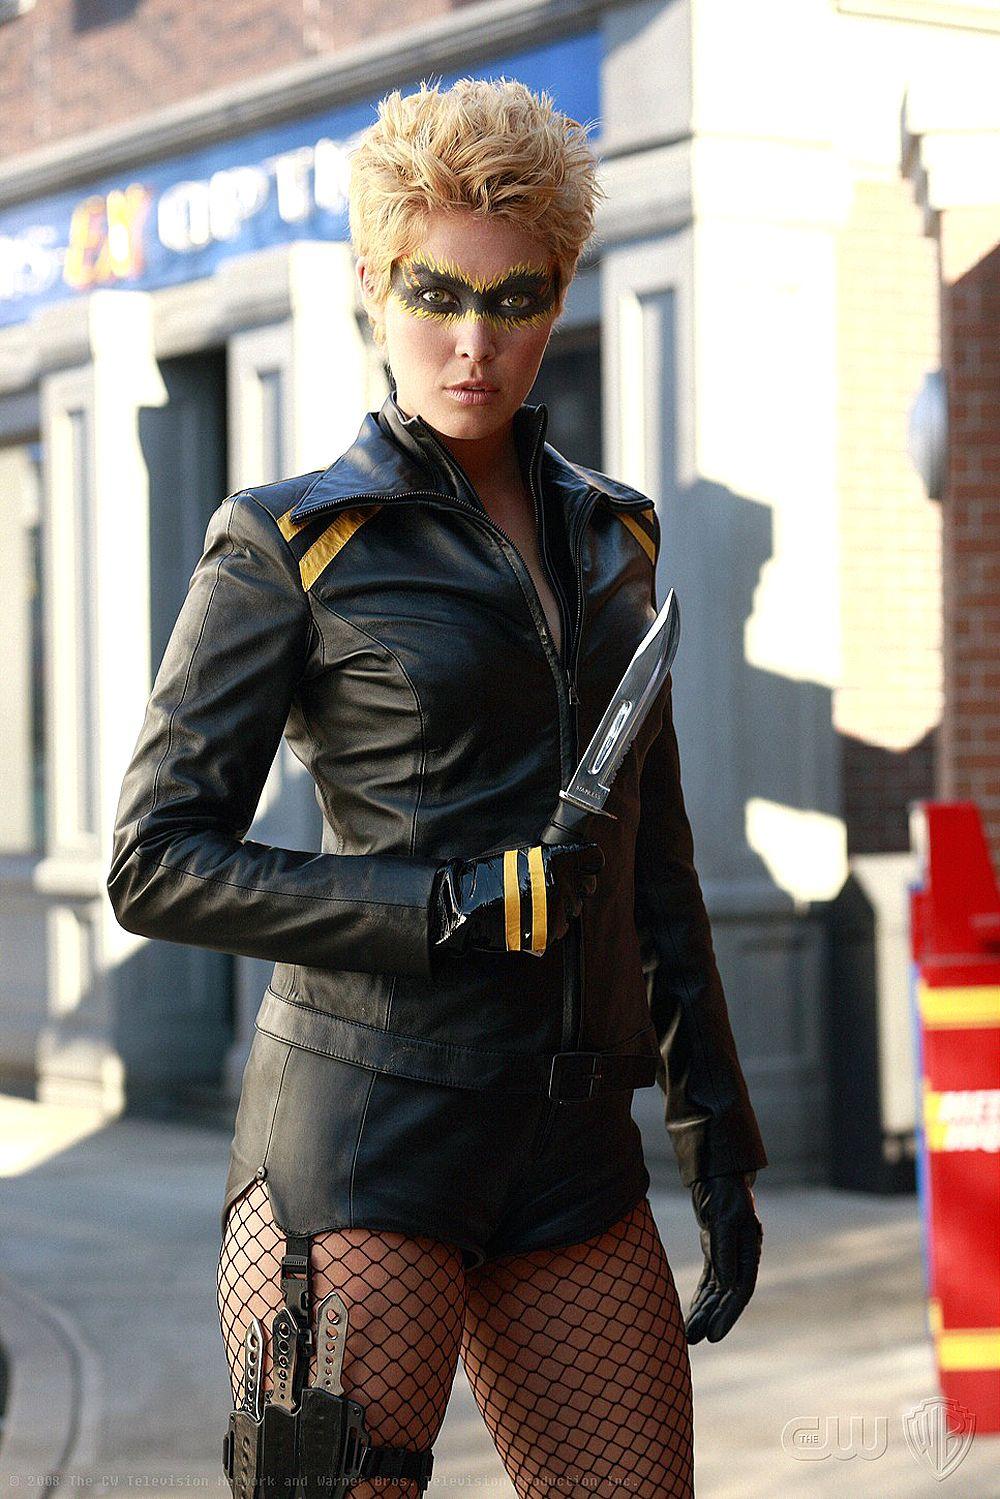 Smallville Canary She Can Scream So Loud Clarks Ears Bleed